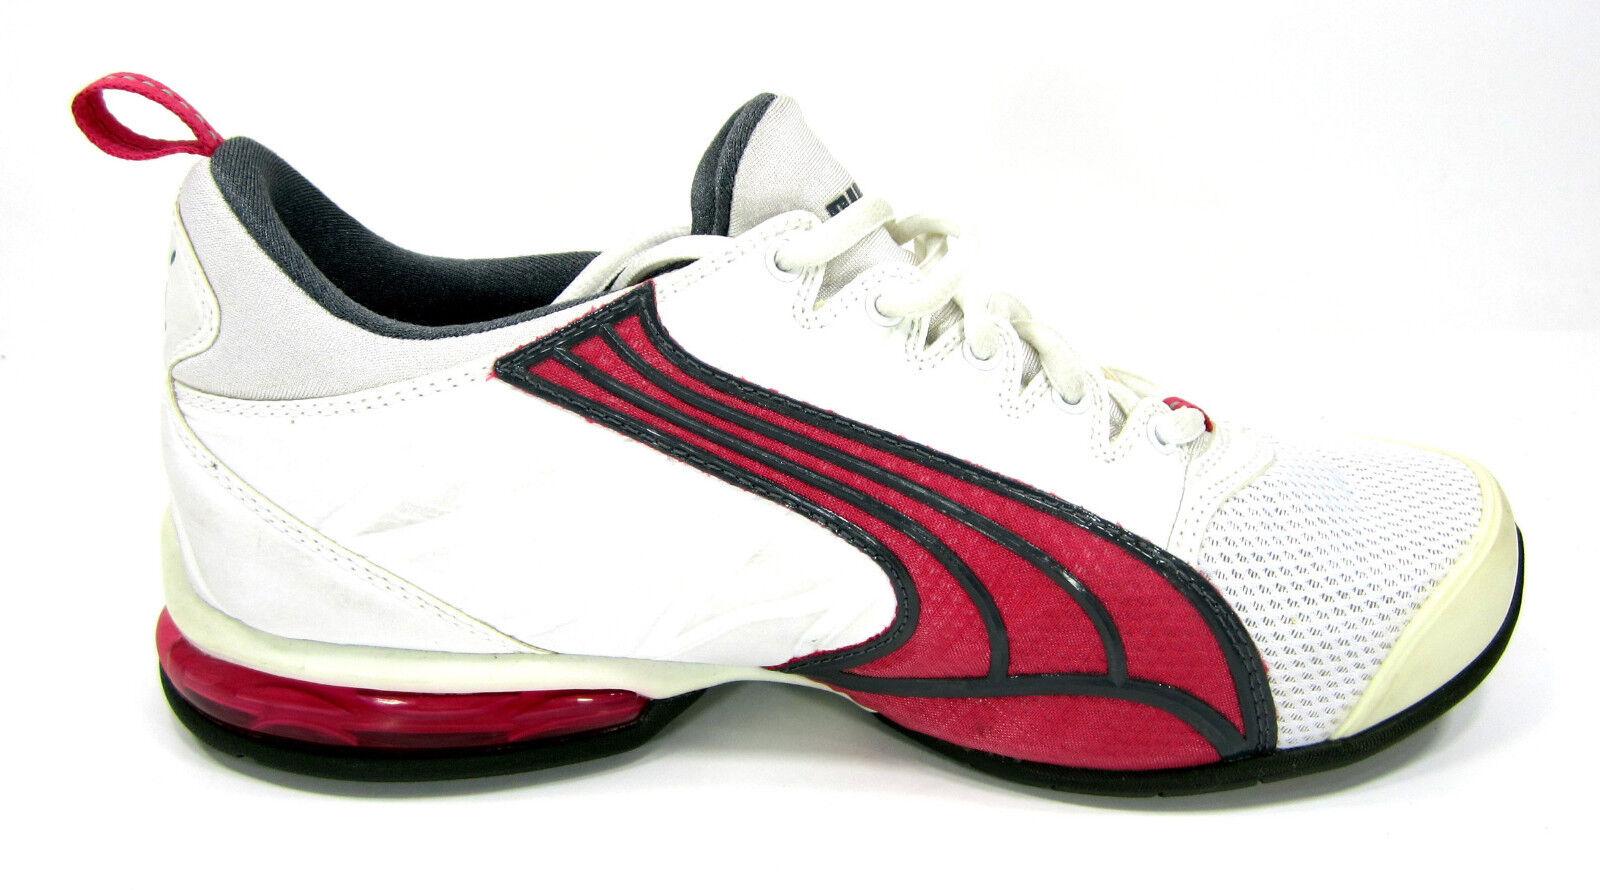 Puma chaussures Athletic Sports Running Running Running blanc Cream  rouge baskets femmes 7 6b20bf